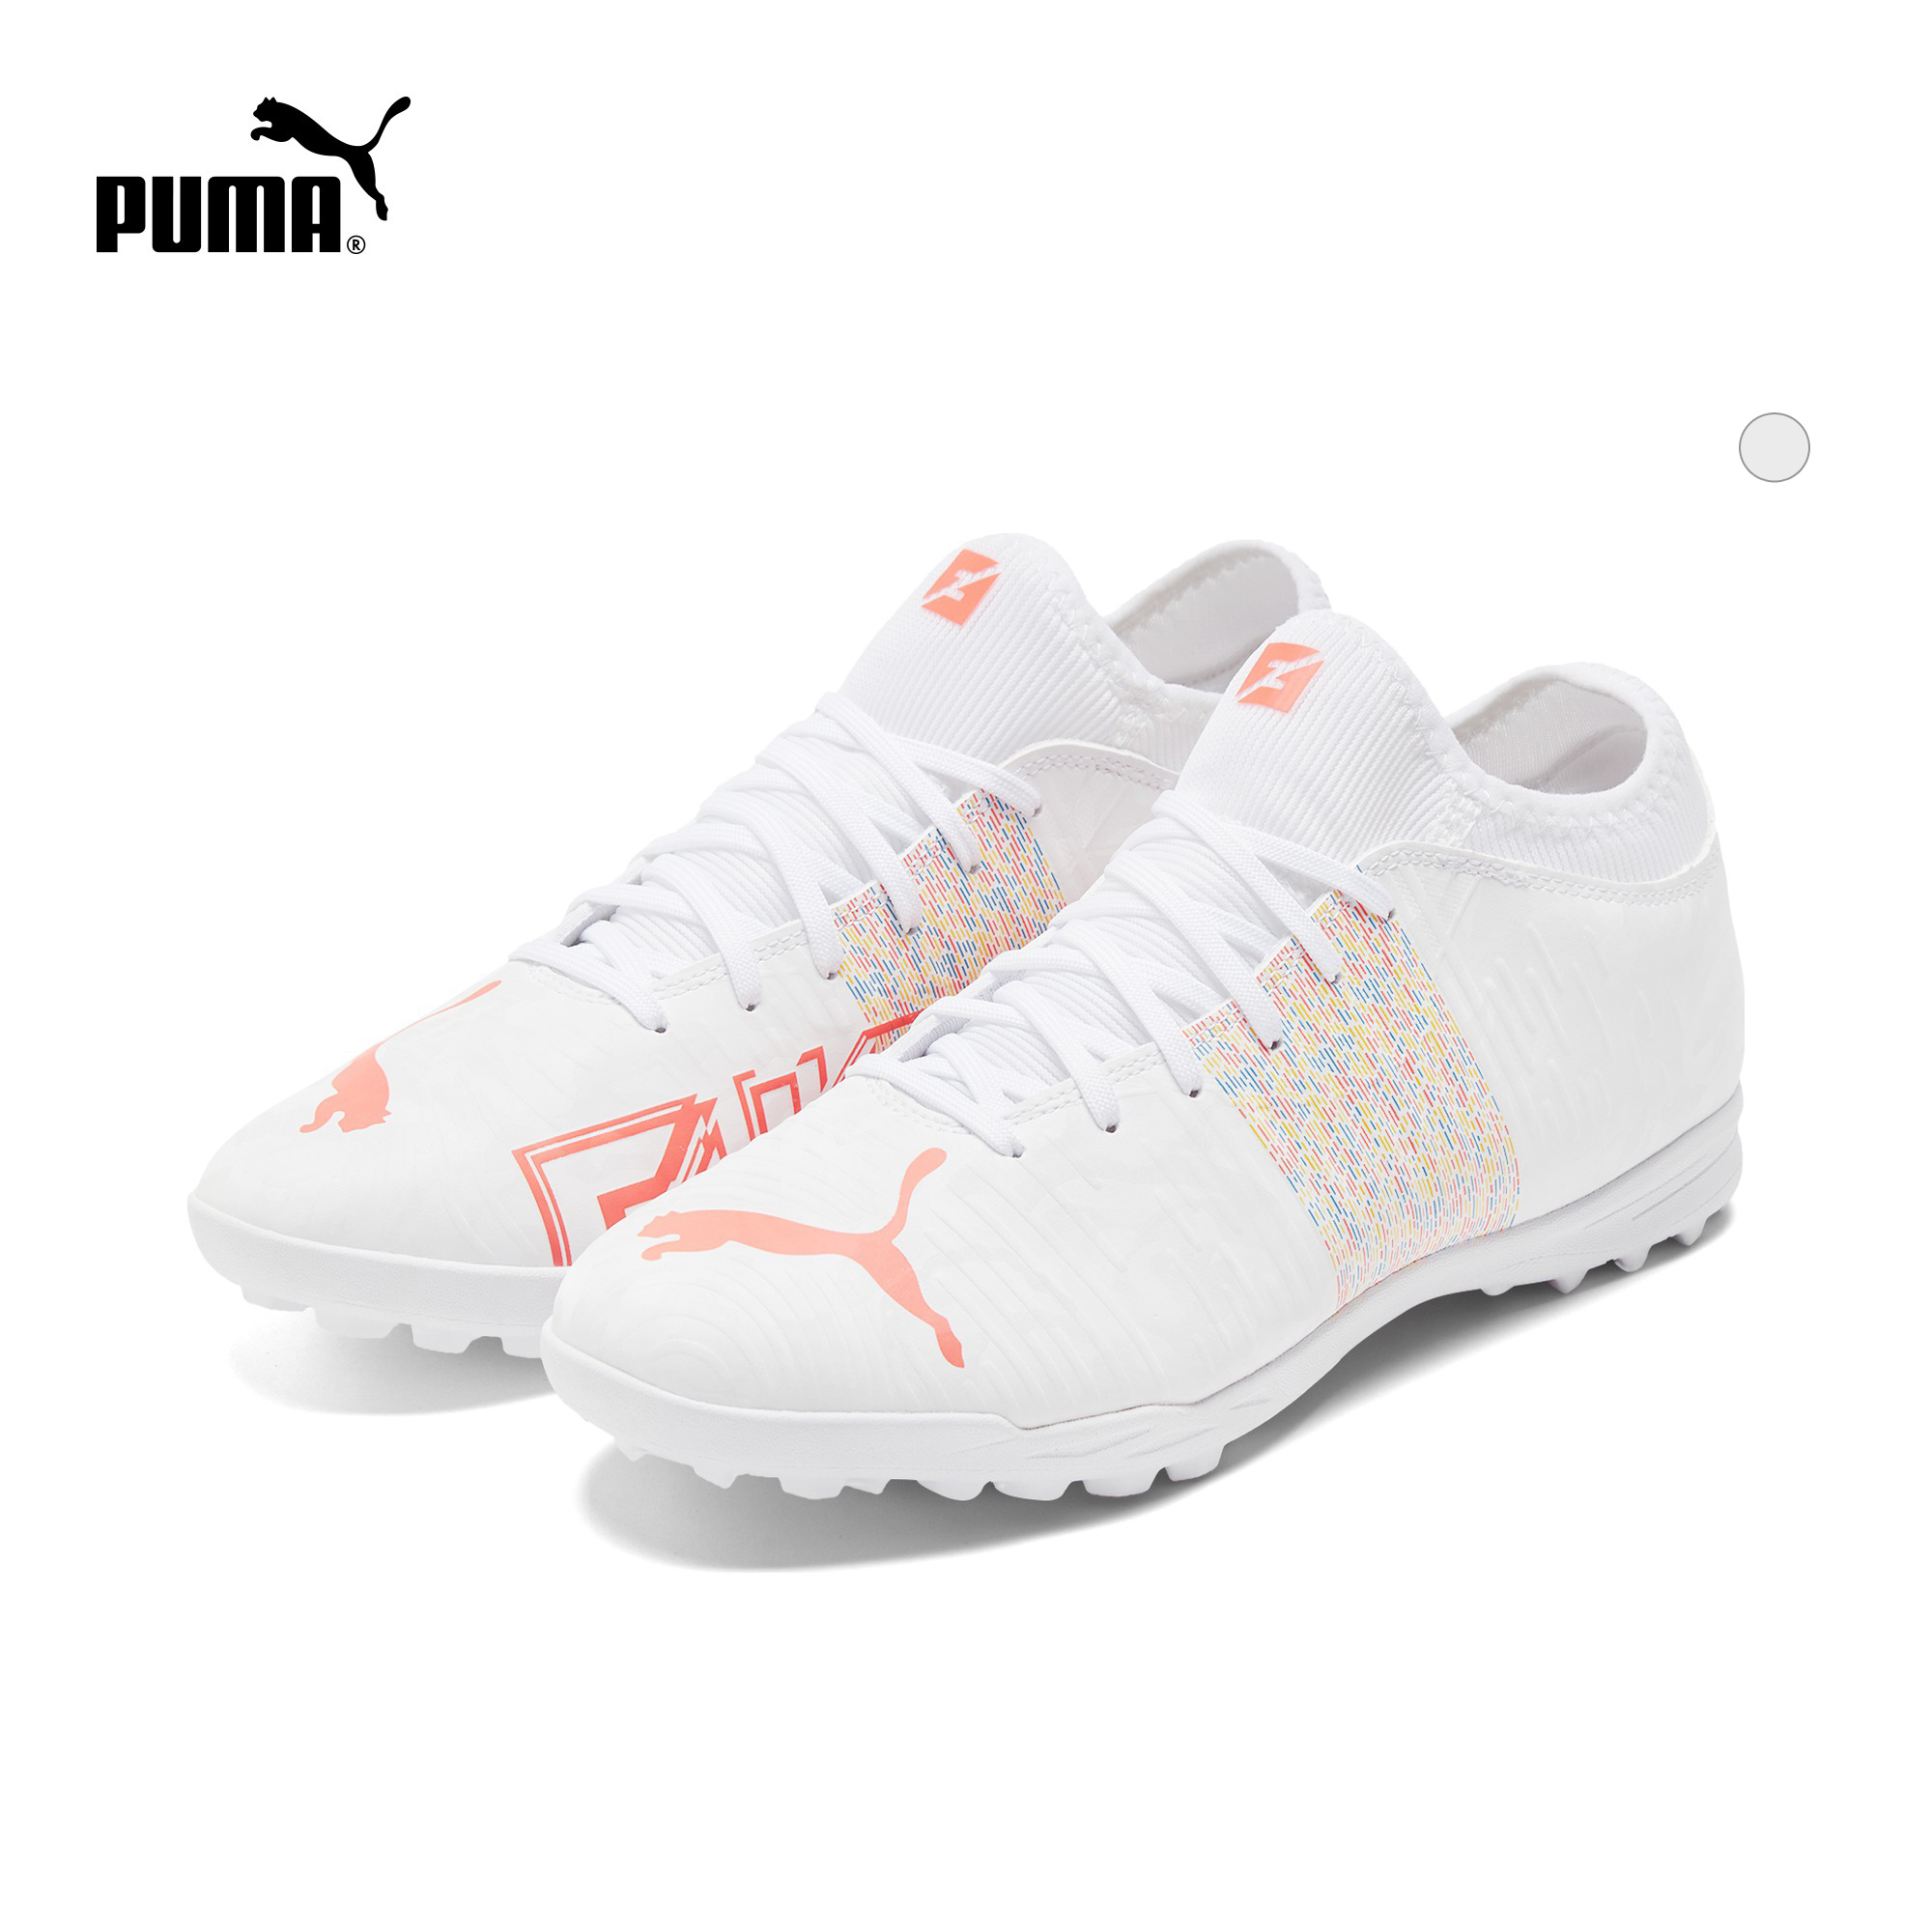 PUMA 彪马 FUTURE TT 106392 男子足球鞋